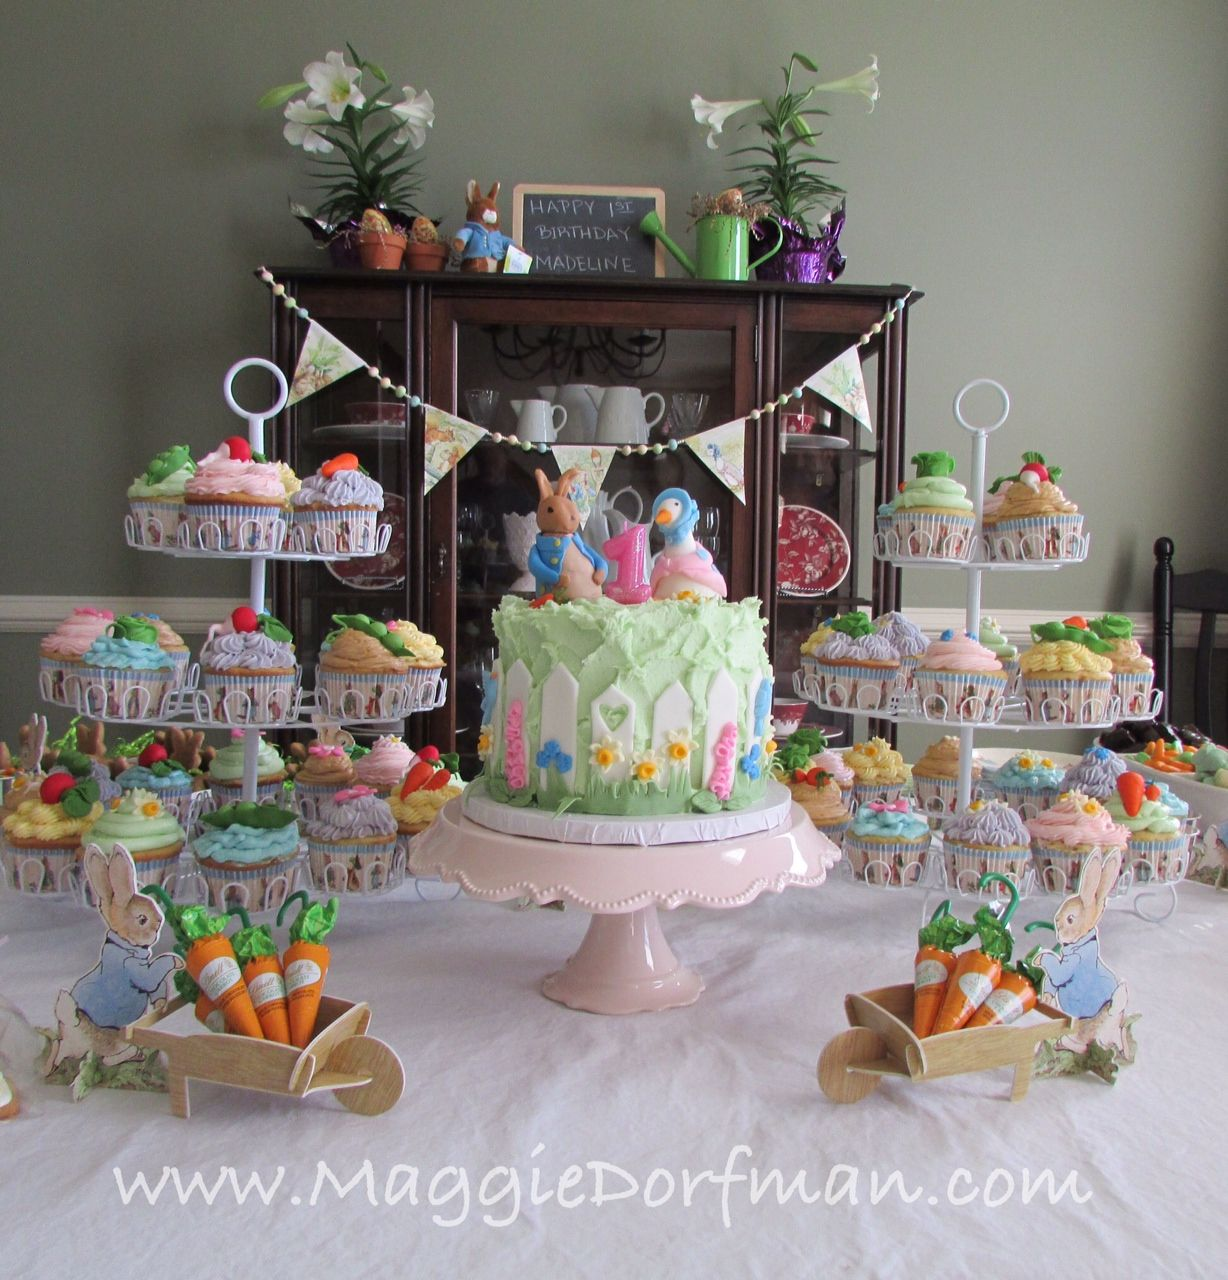 Garden decor for baby shower  Peter Rabbit Baby Shower Cakes  baby shower cupcakes easy  Baby